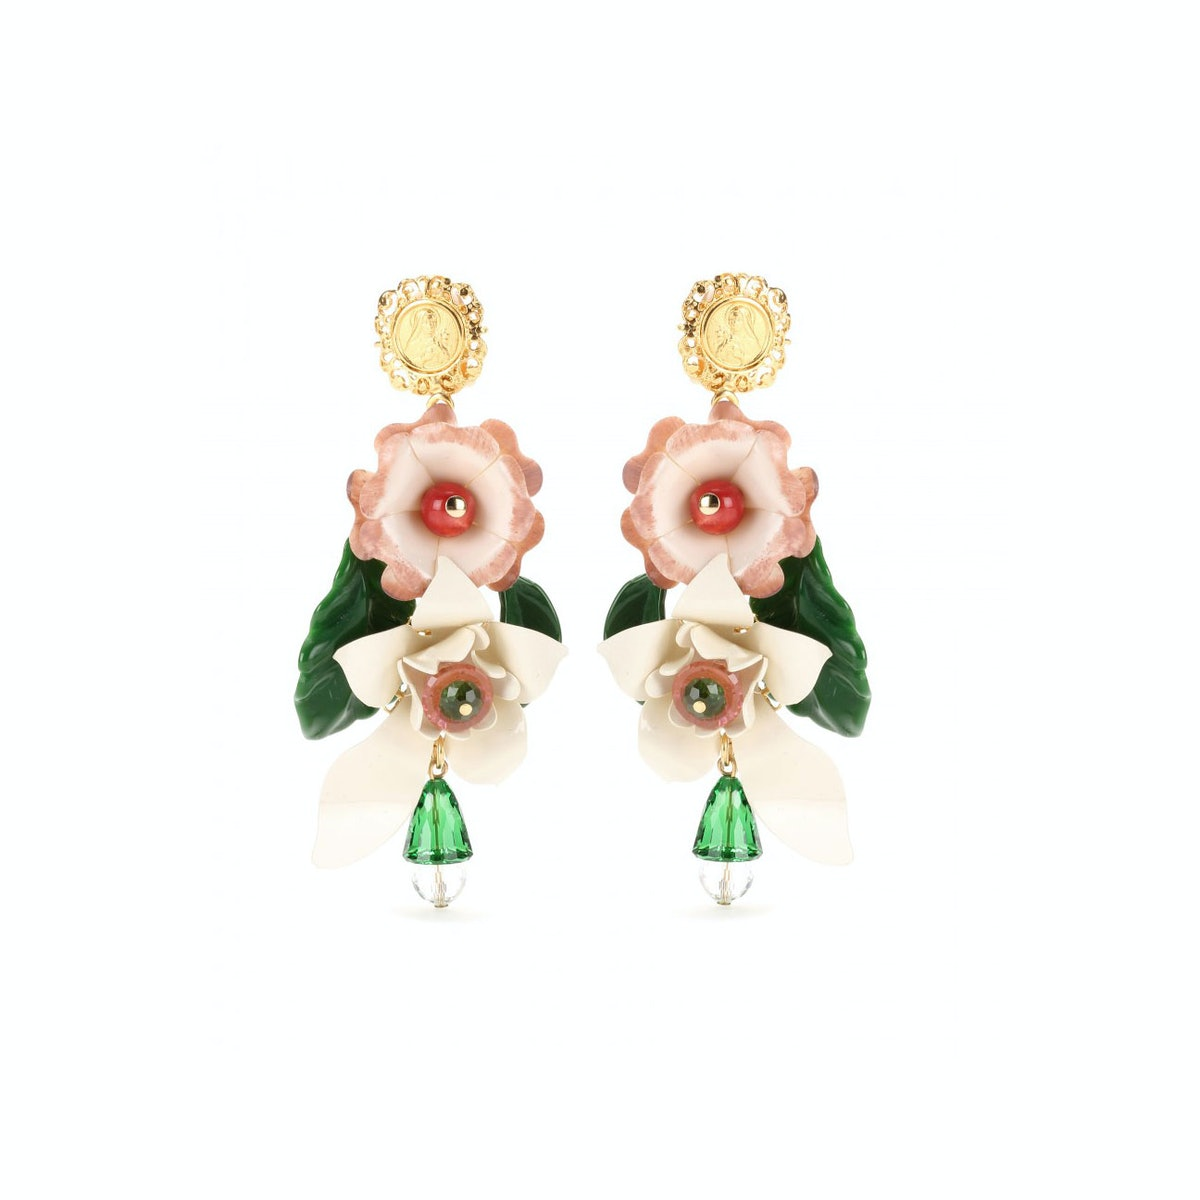 Dolce and Gabbana earrings